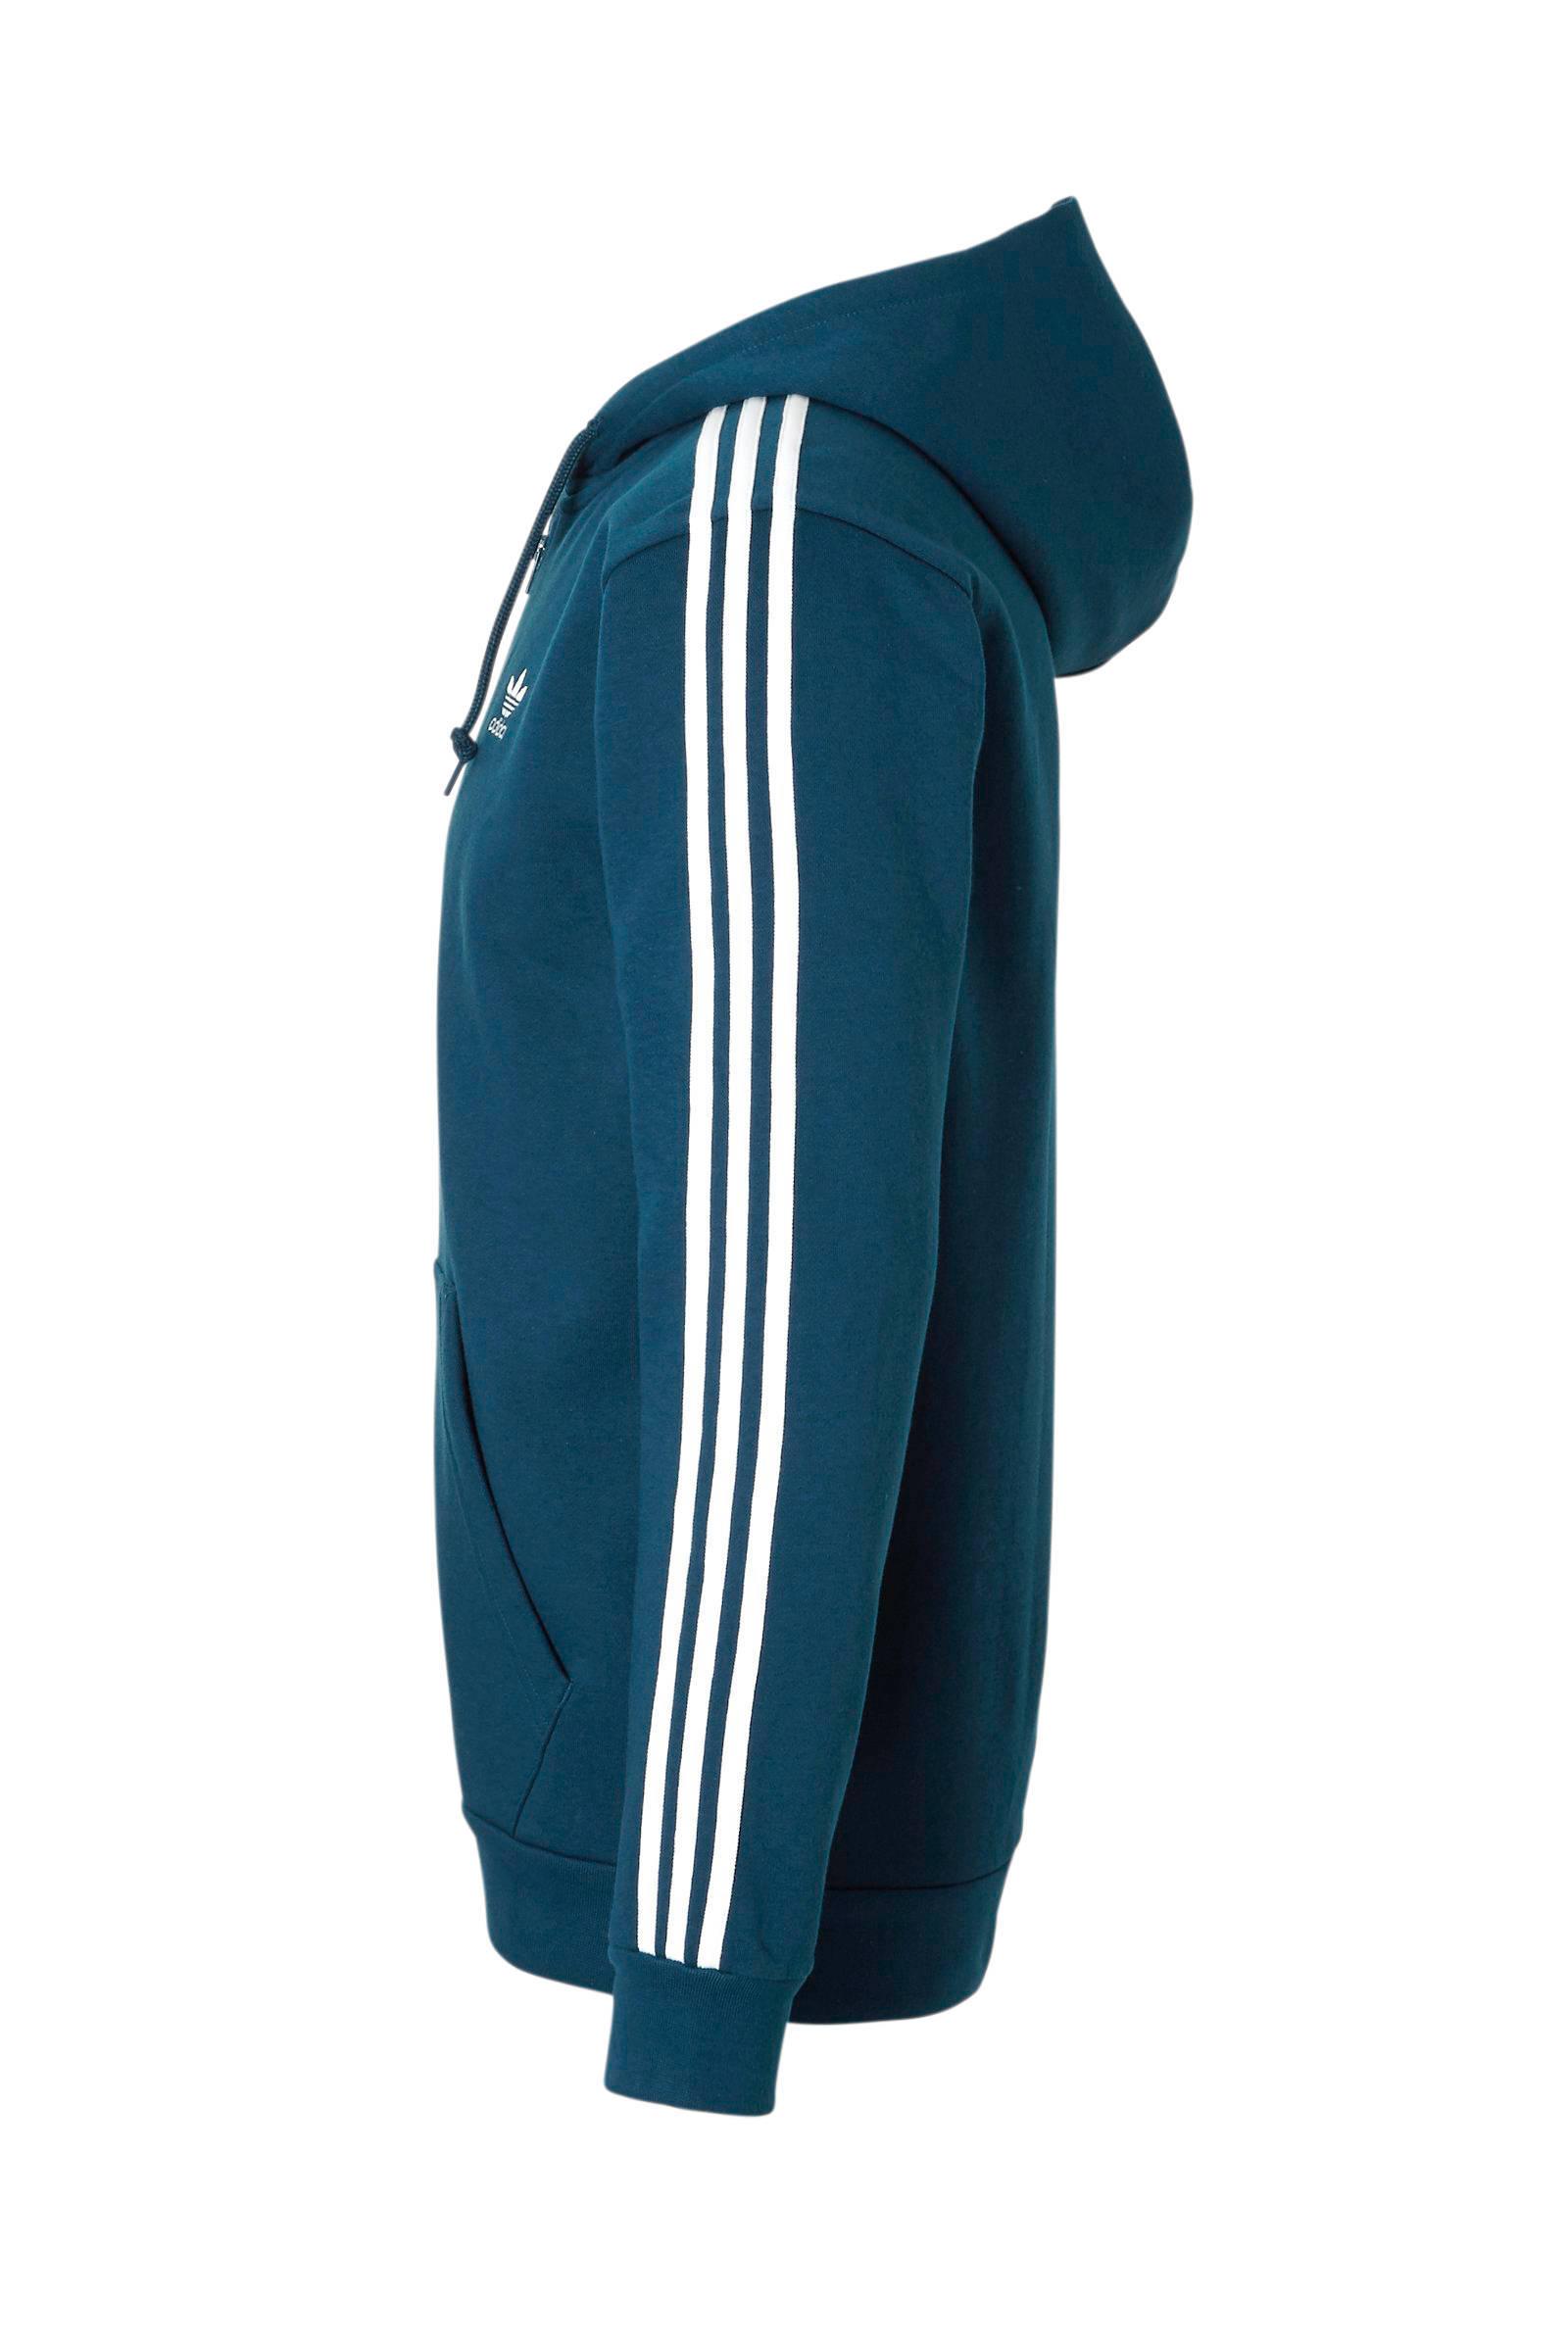 adidas Originals vest petrol   wehkamp